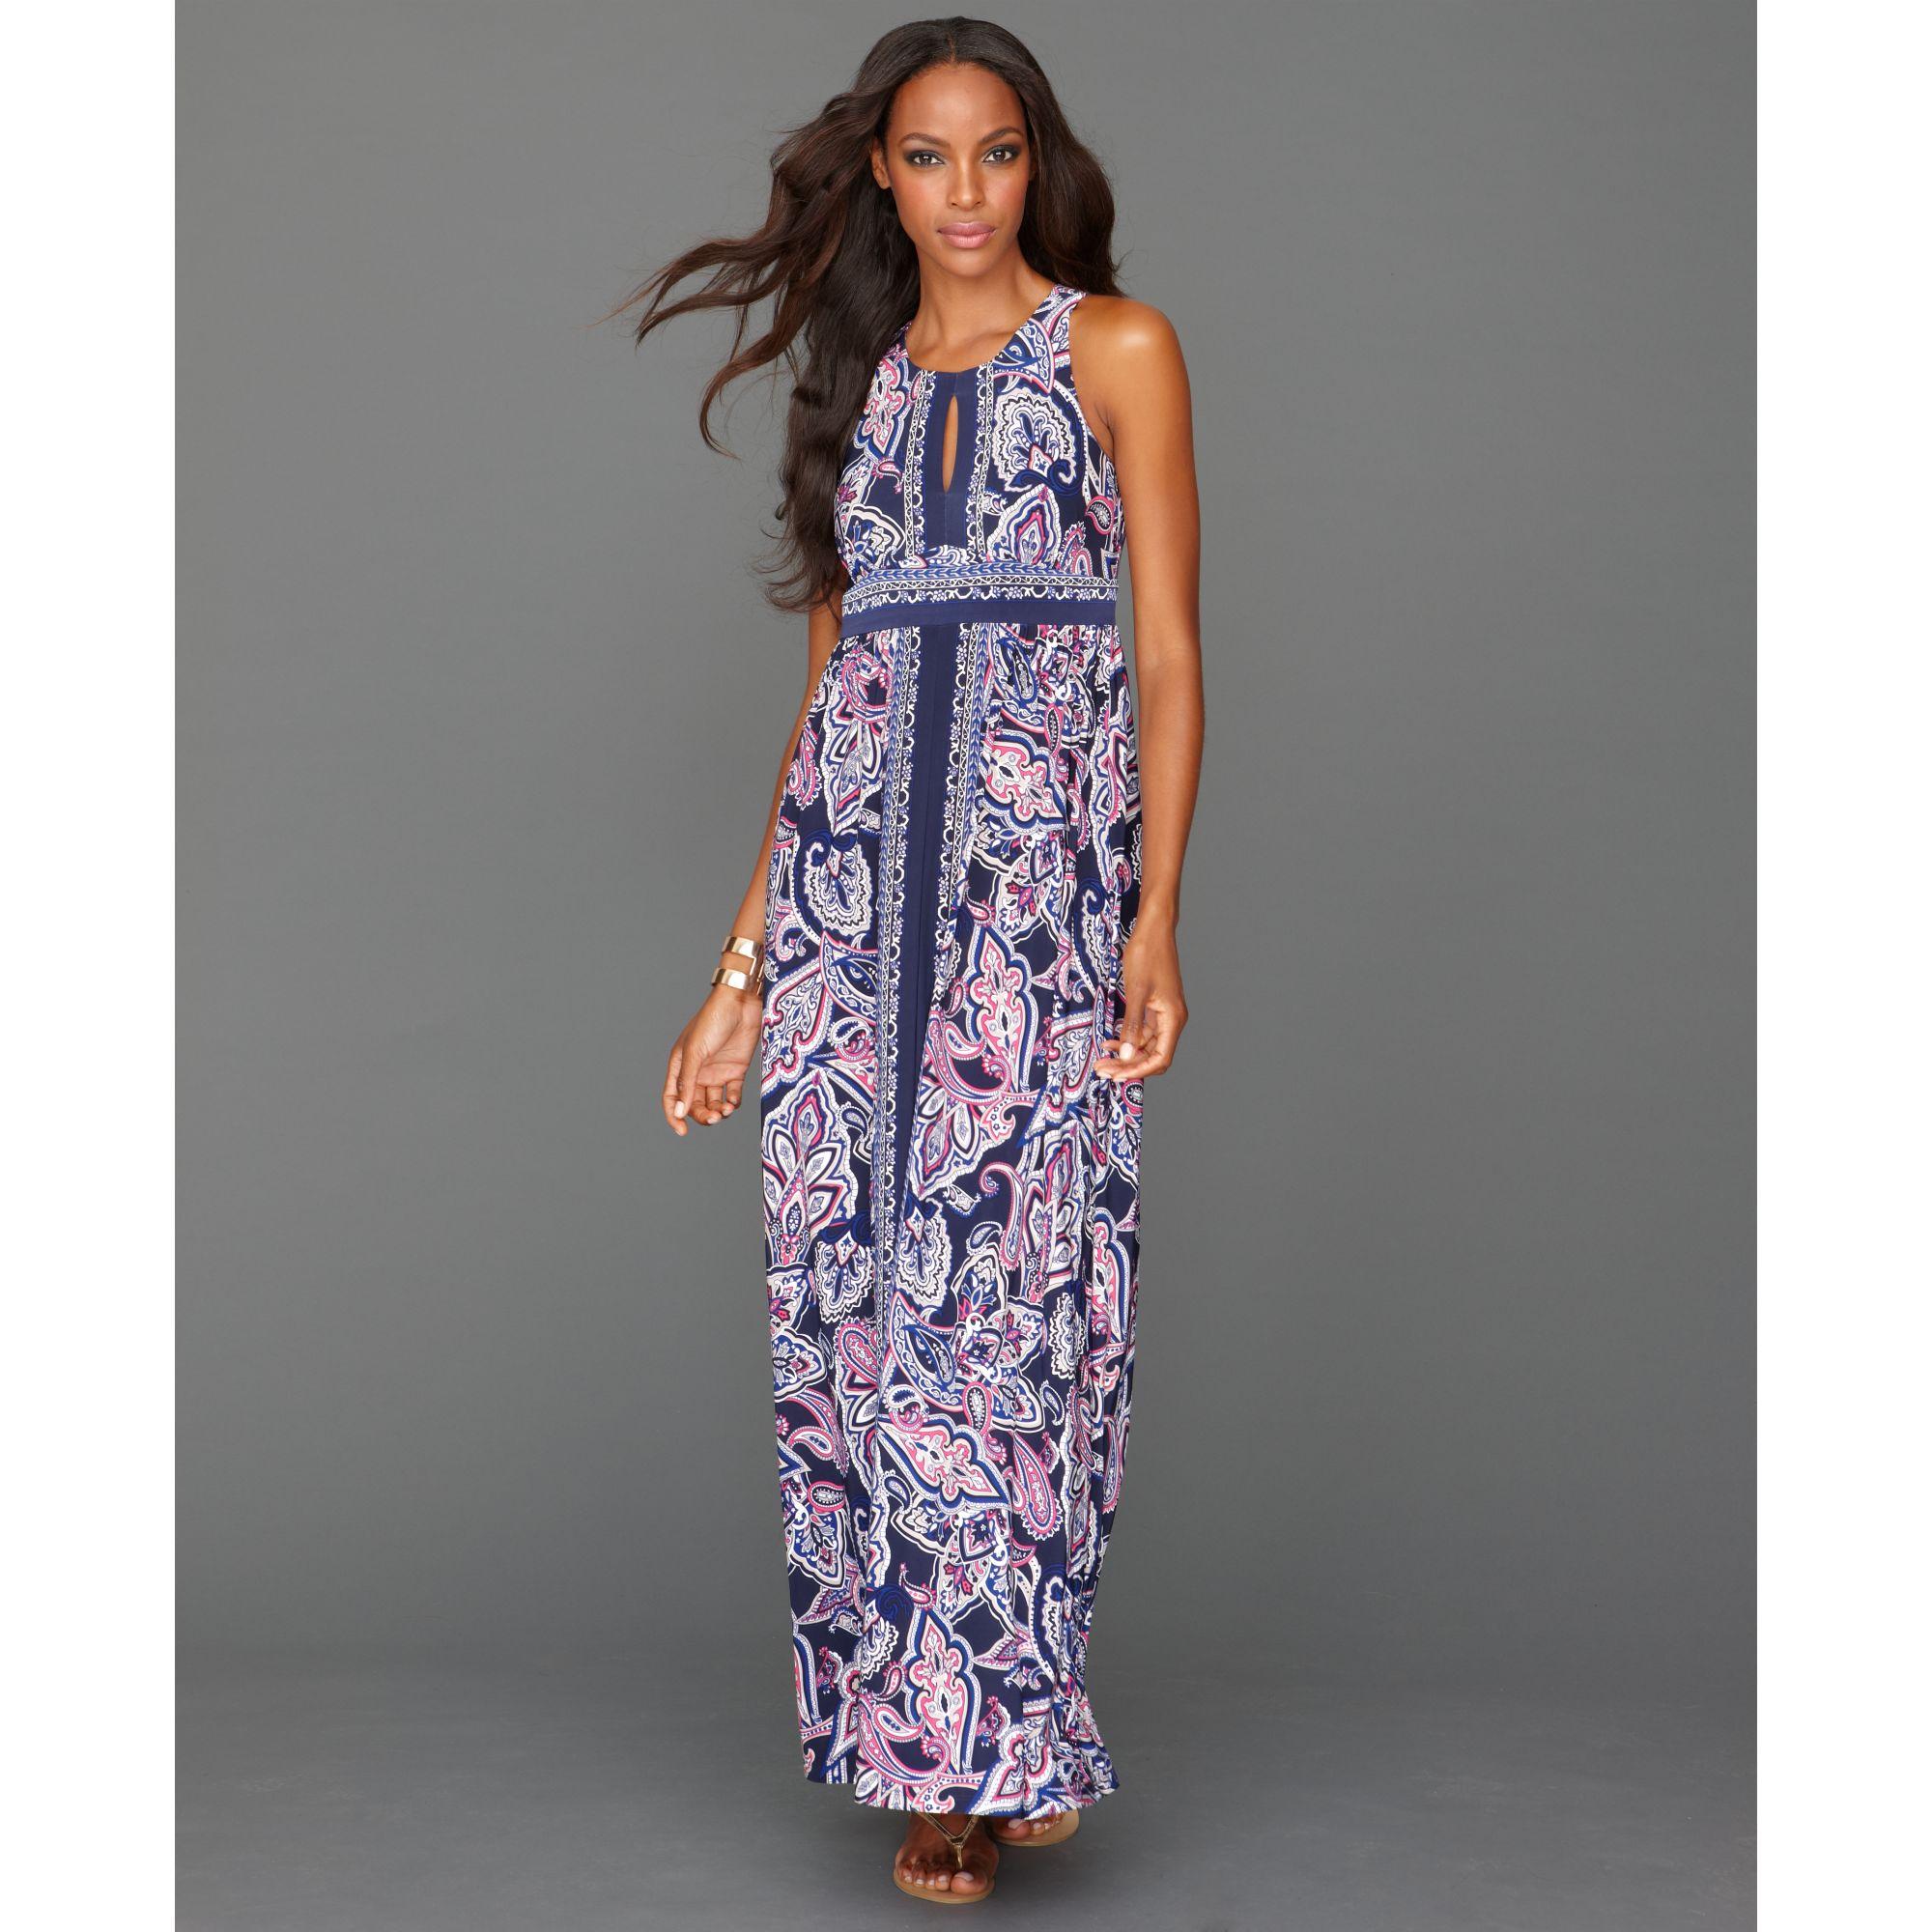 inc international concepts dress sleeveless printed maxi dress ...